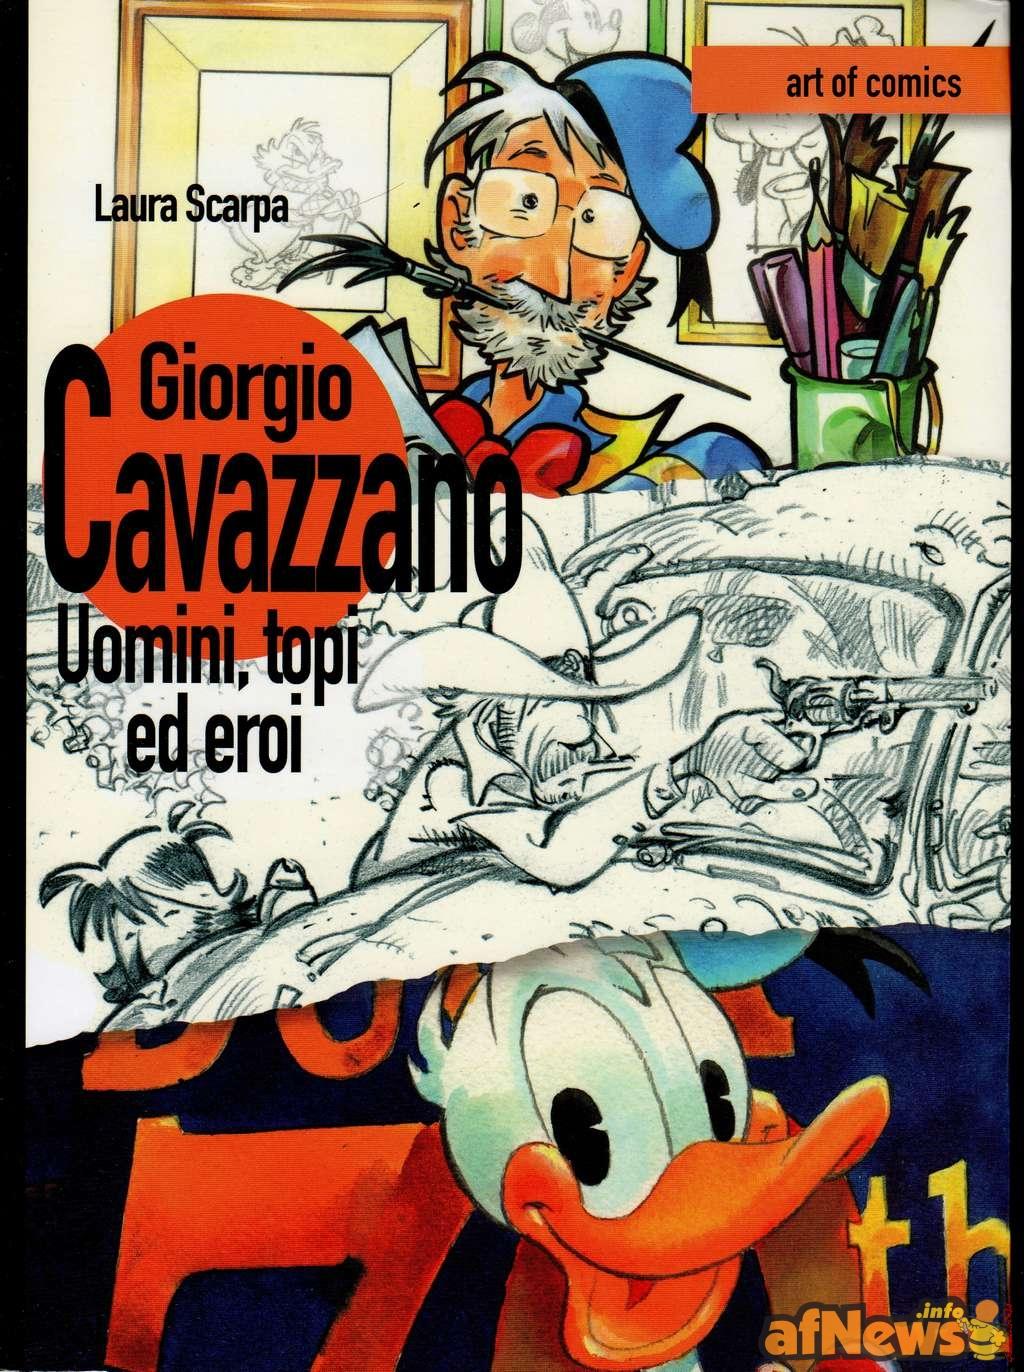 2015-07-28-afnewsscan-2015-657 Cavazzano libro